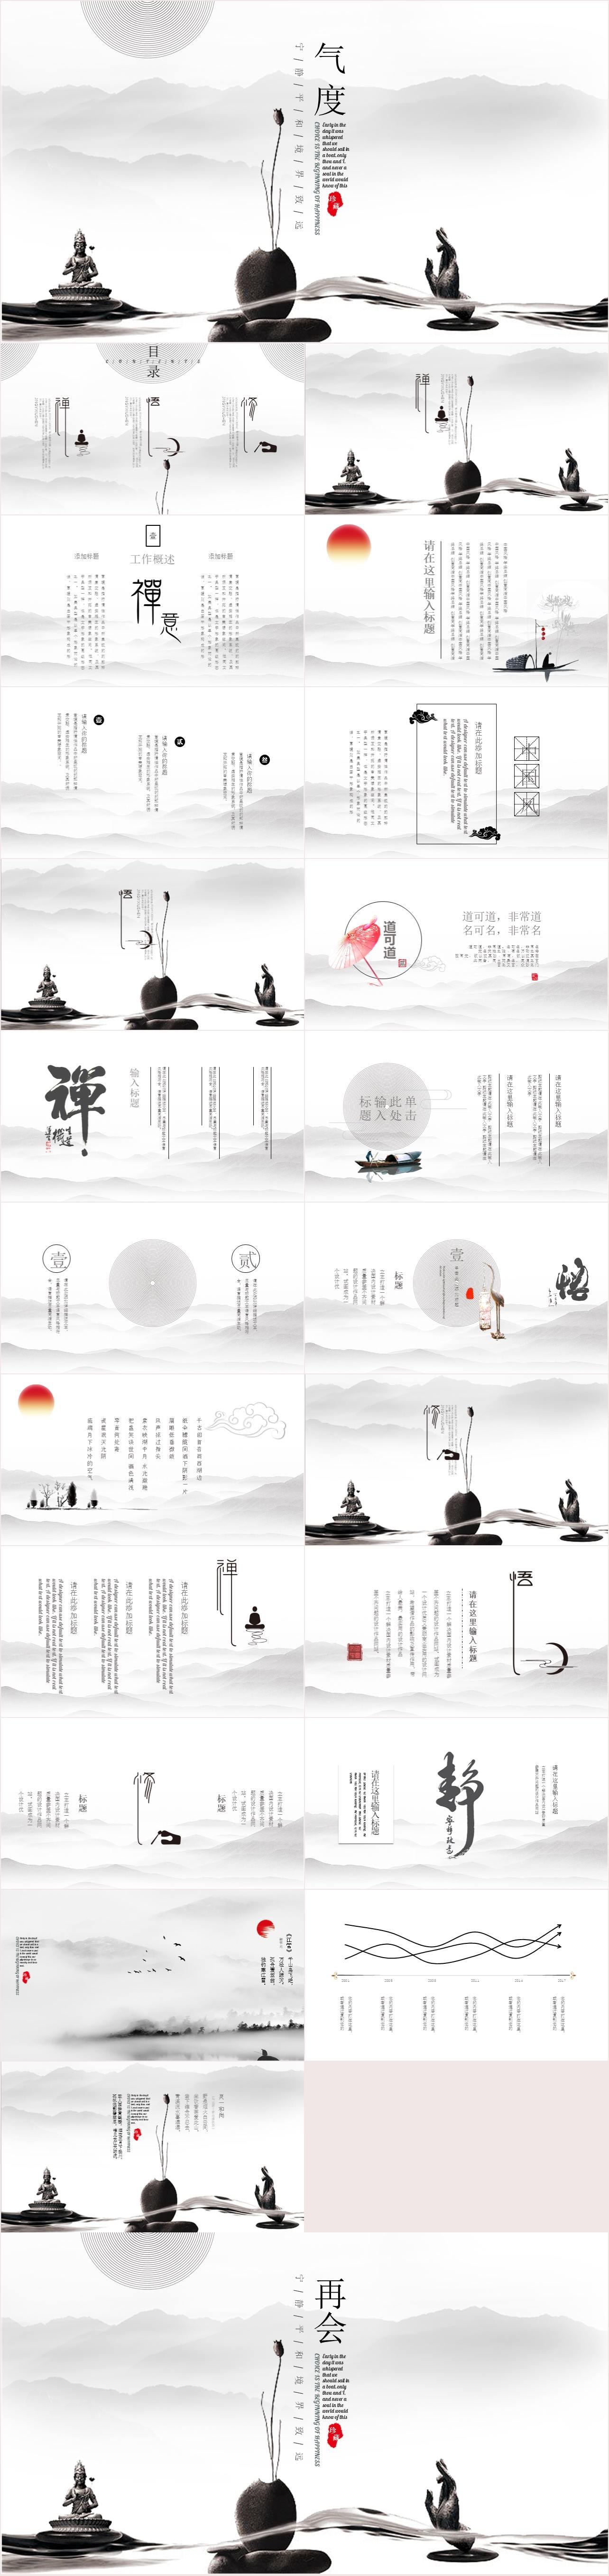 VC00158 中国风禅文化简白PPT模板